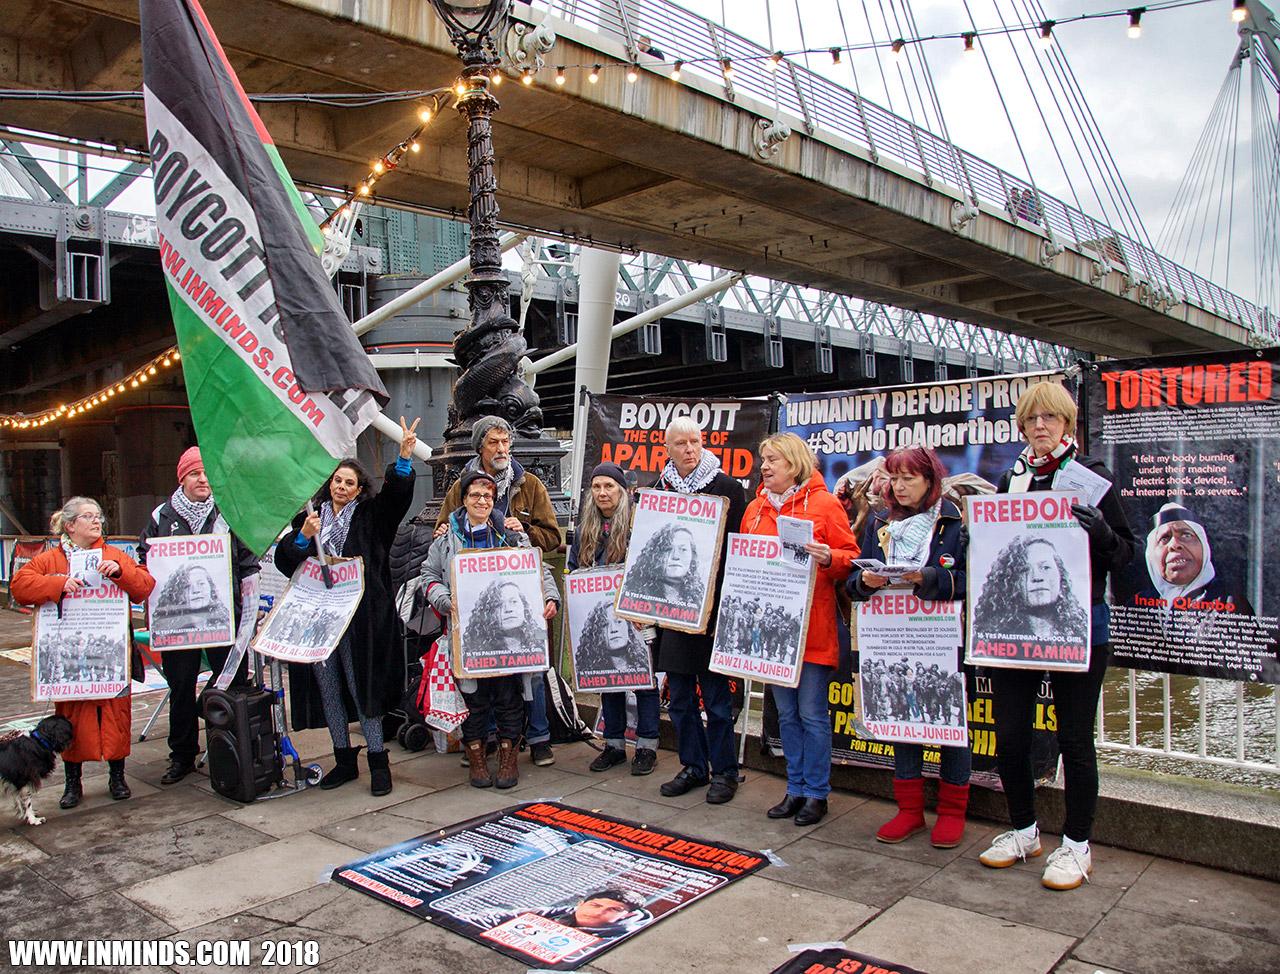 Boycott Israel News: London Protest Demands Free the